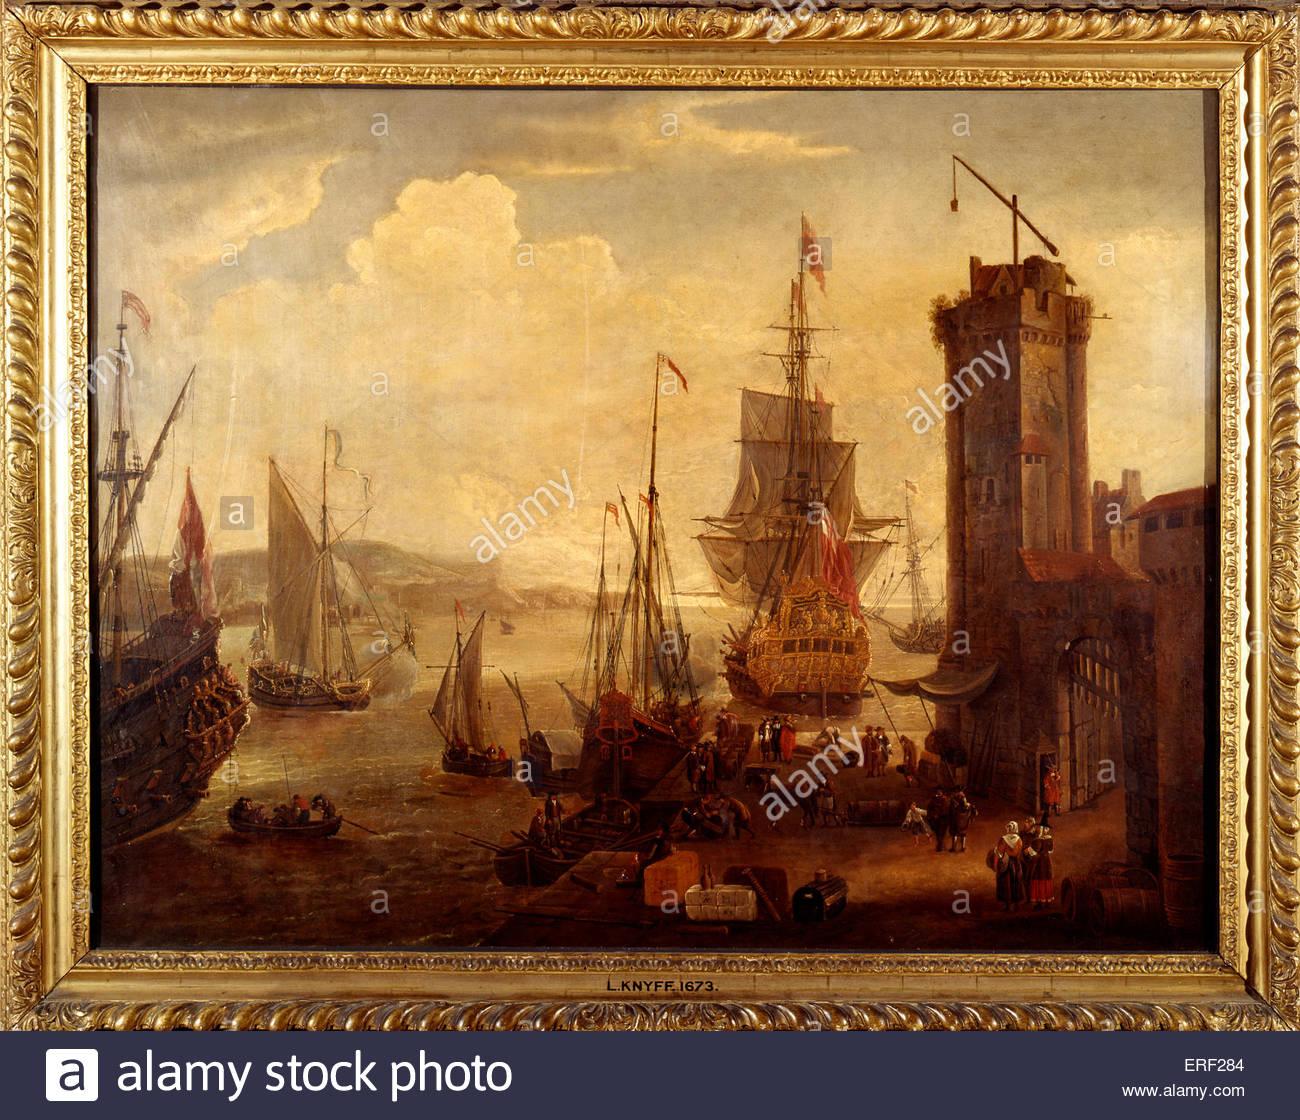 English Port Scene by Leonard Knyff, 1673. Dutch draughtsman and painter, 1650 - 1721. - Stock Image